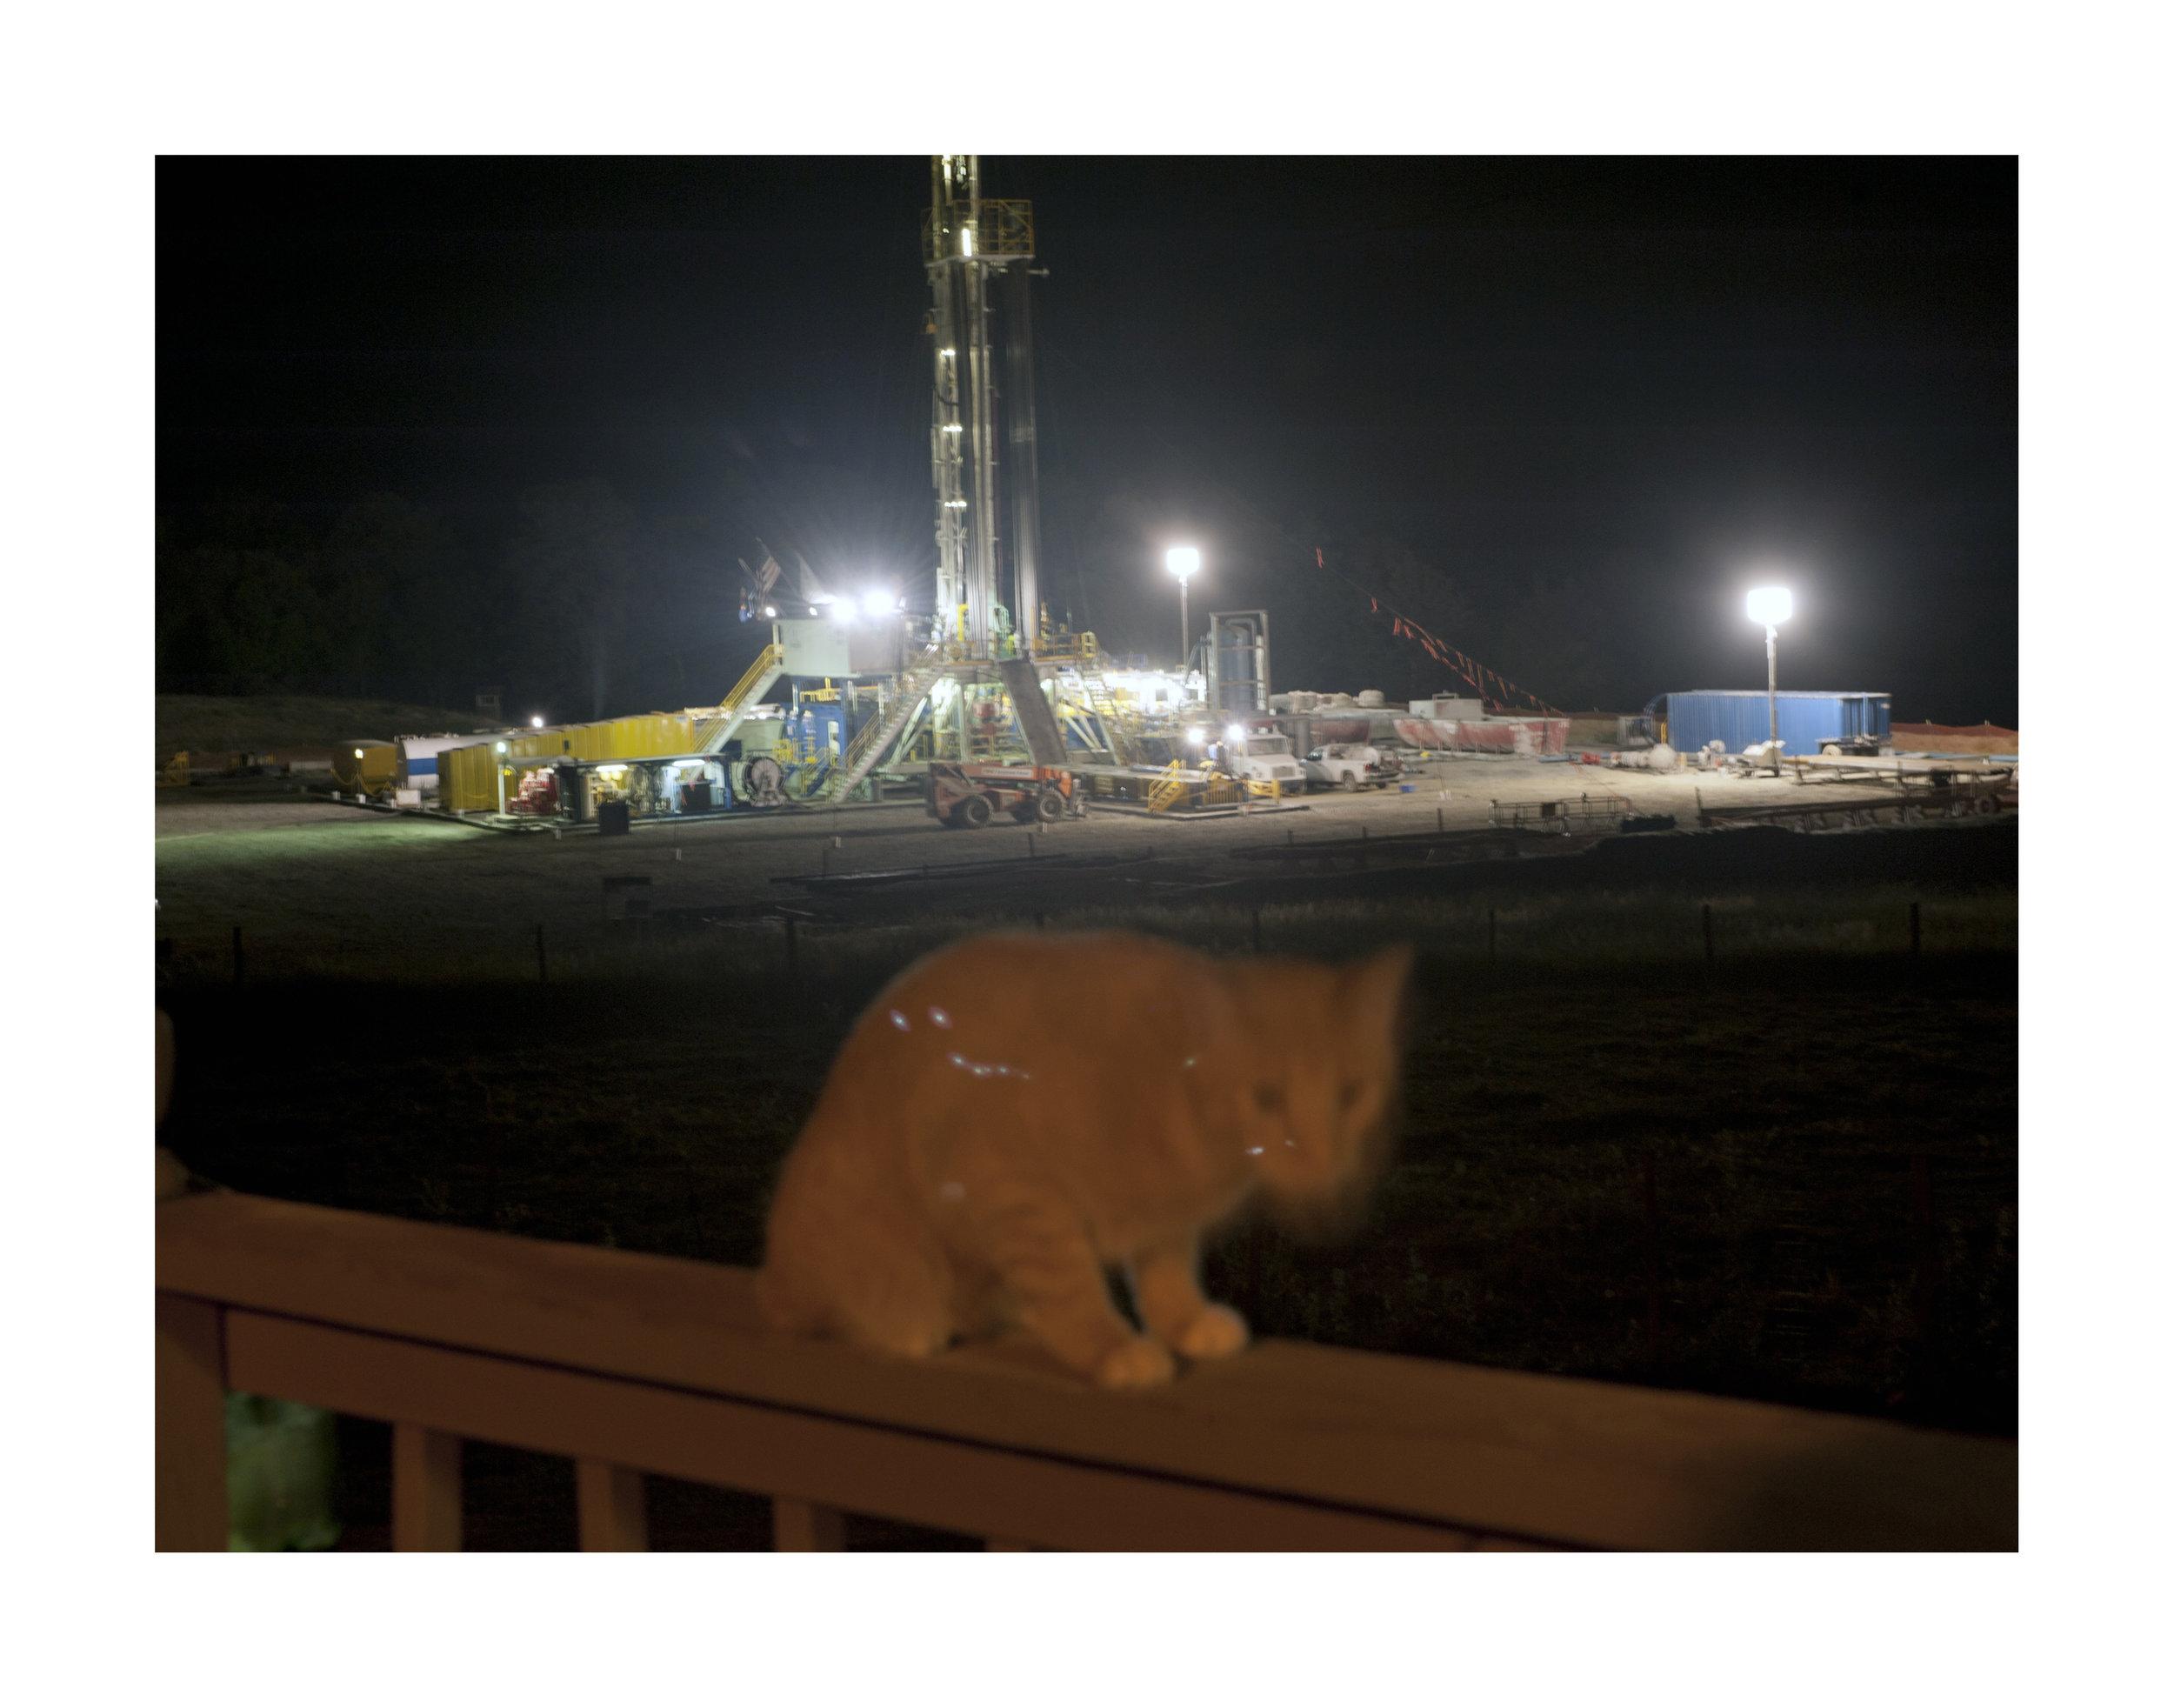 A cat on a terrace near a Chesapeake drill rig